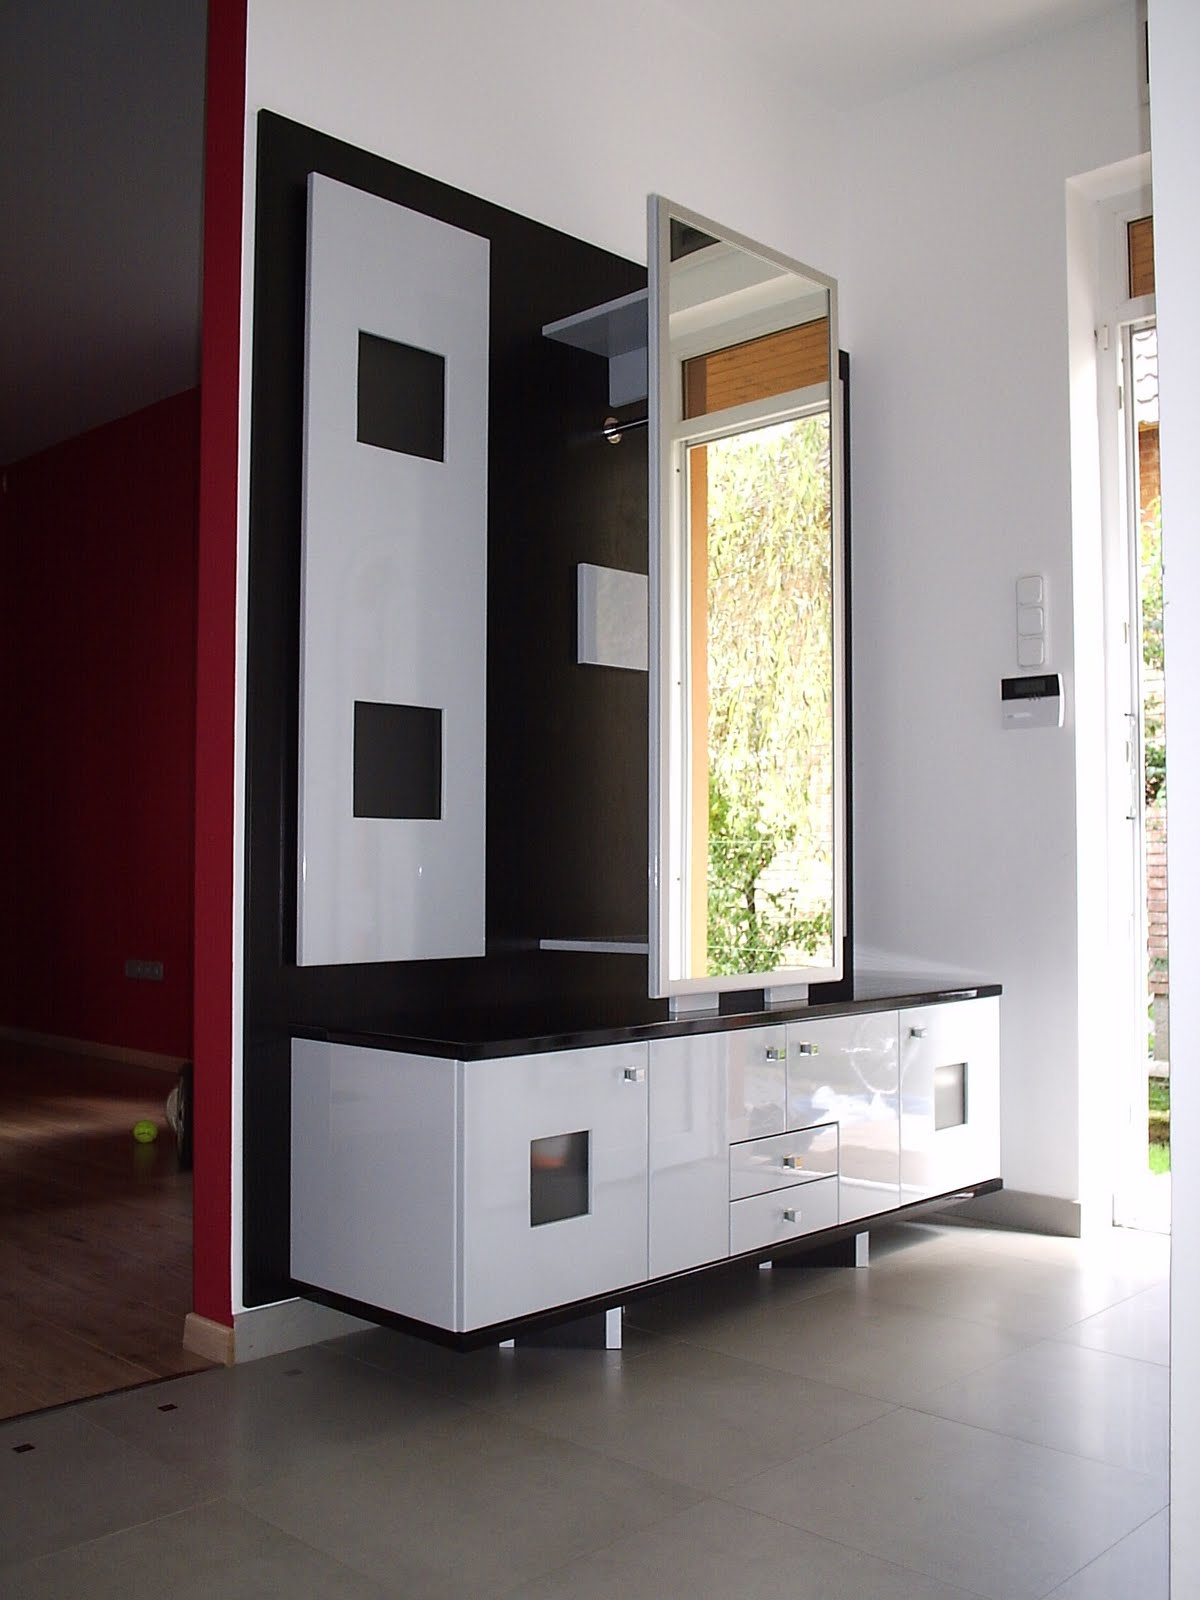 Modern Minimal Furdoszoba Butor – Siamso.com